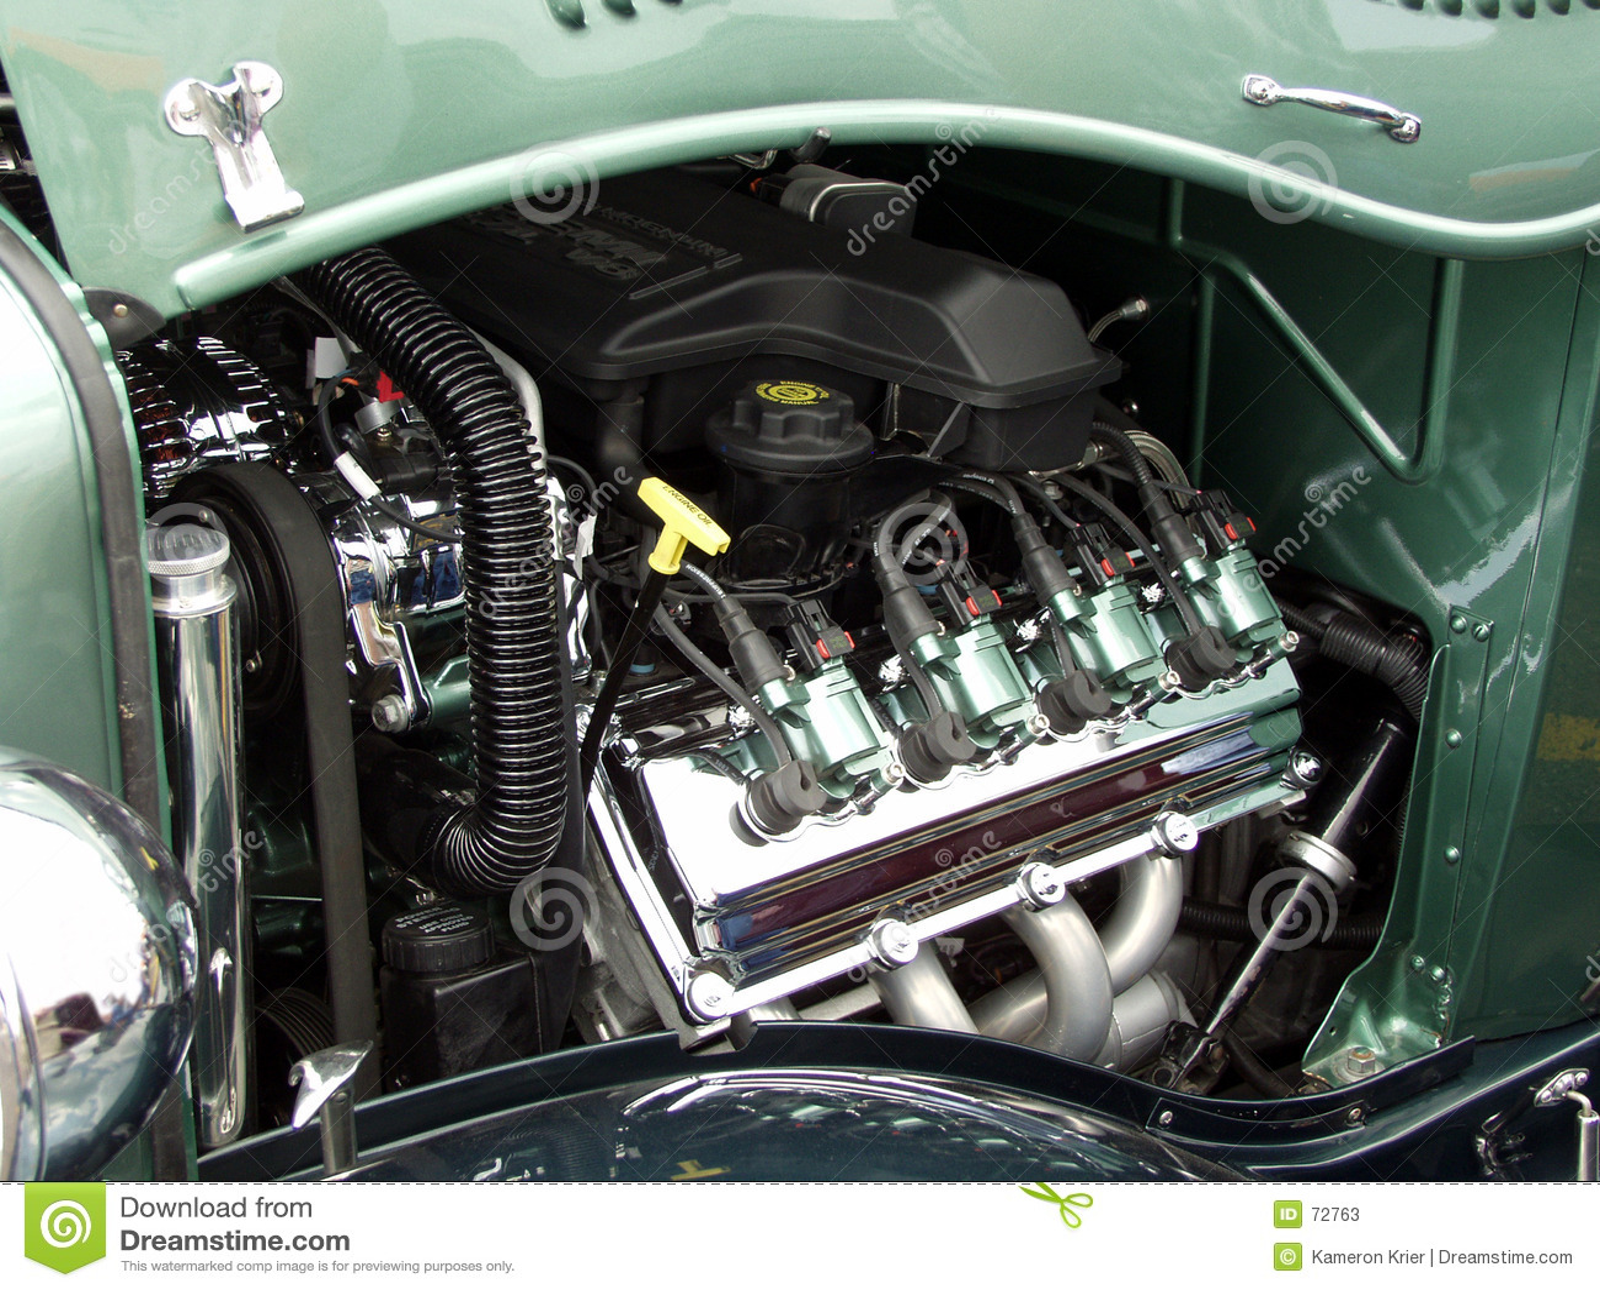 How To Polish Chrome On A Car Engine Parts